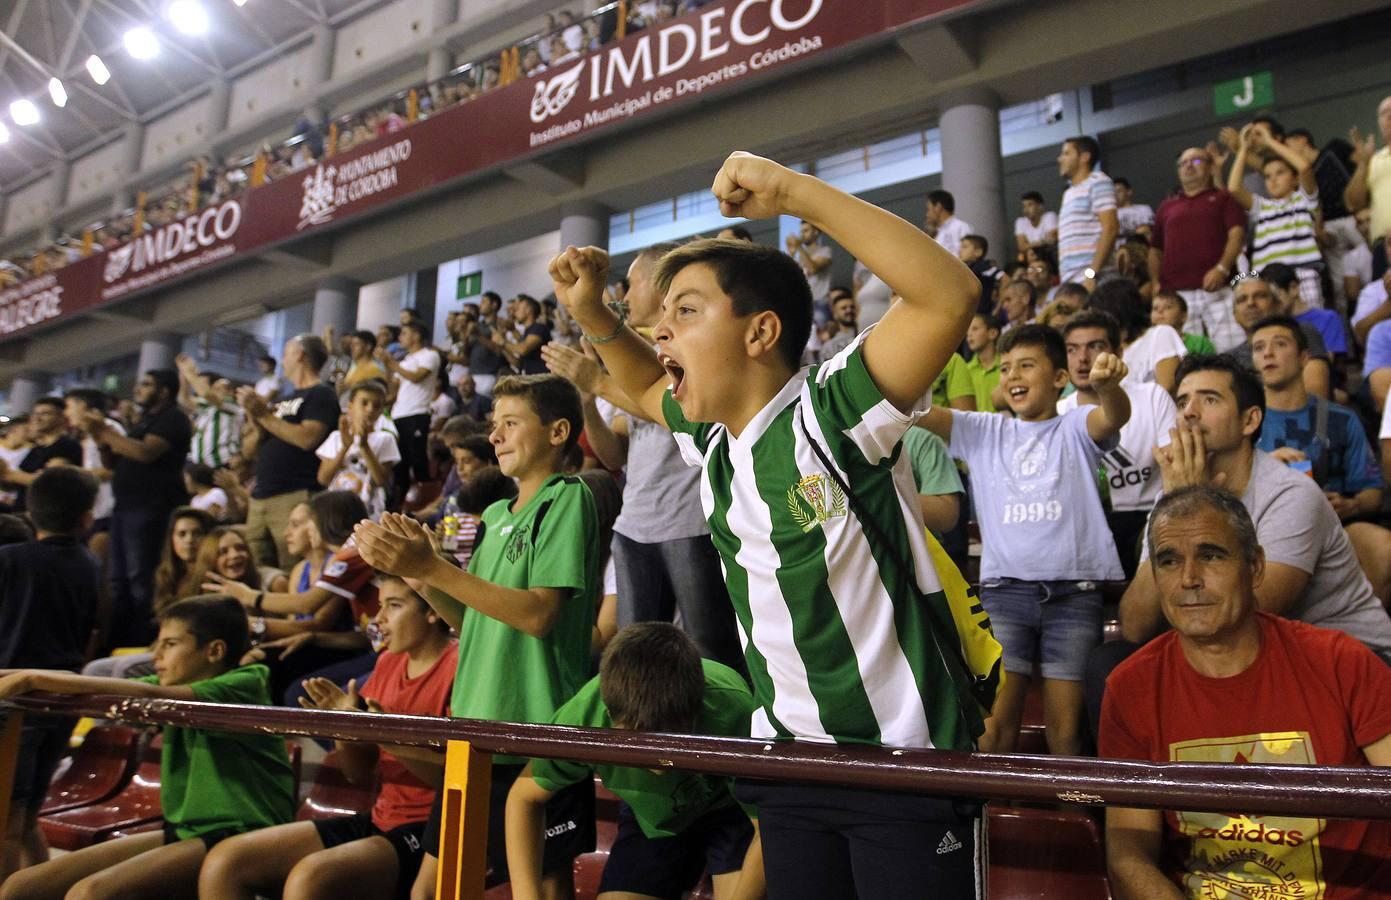 Espectáculo de futsal en Córdoba